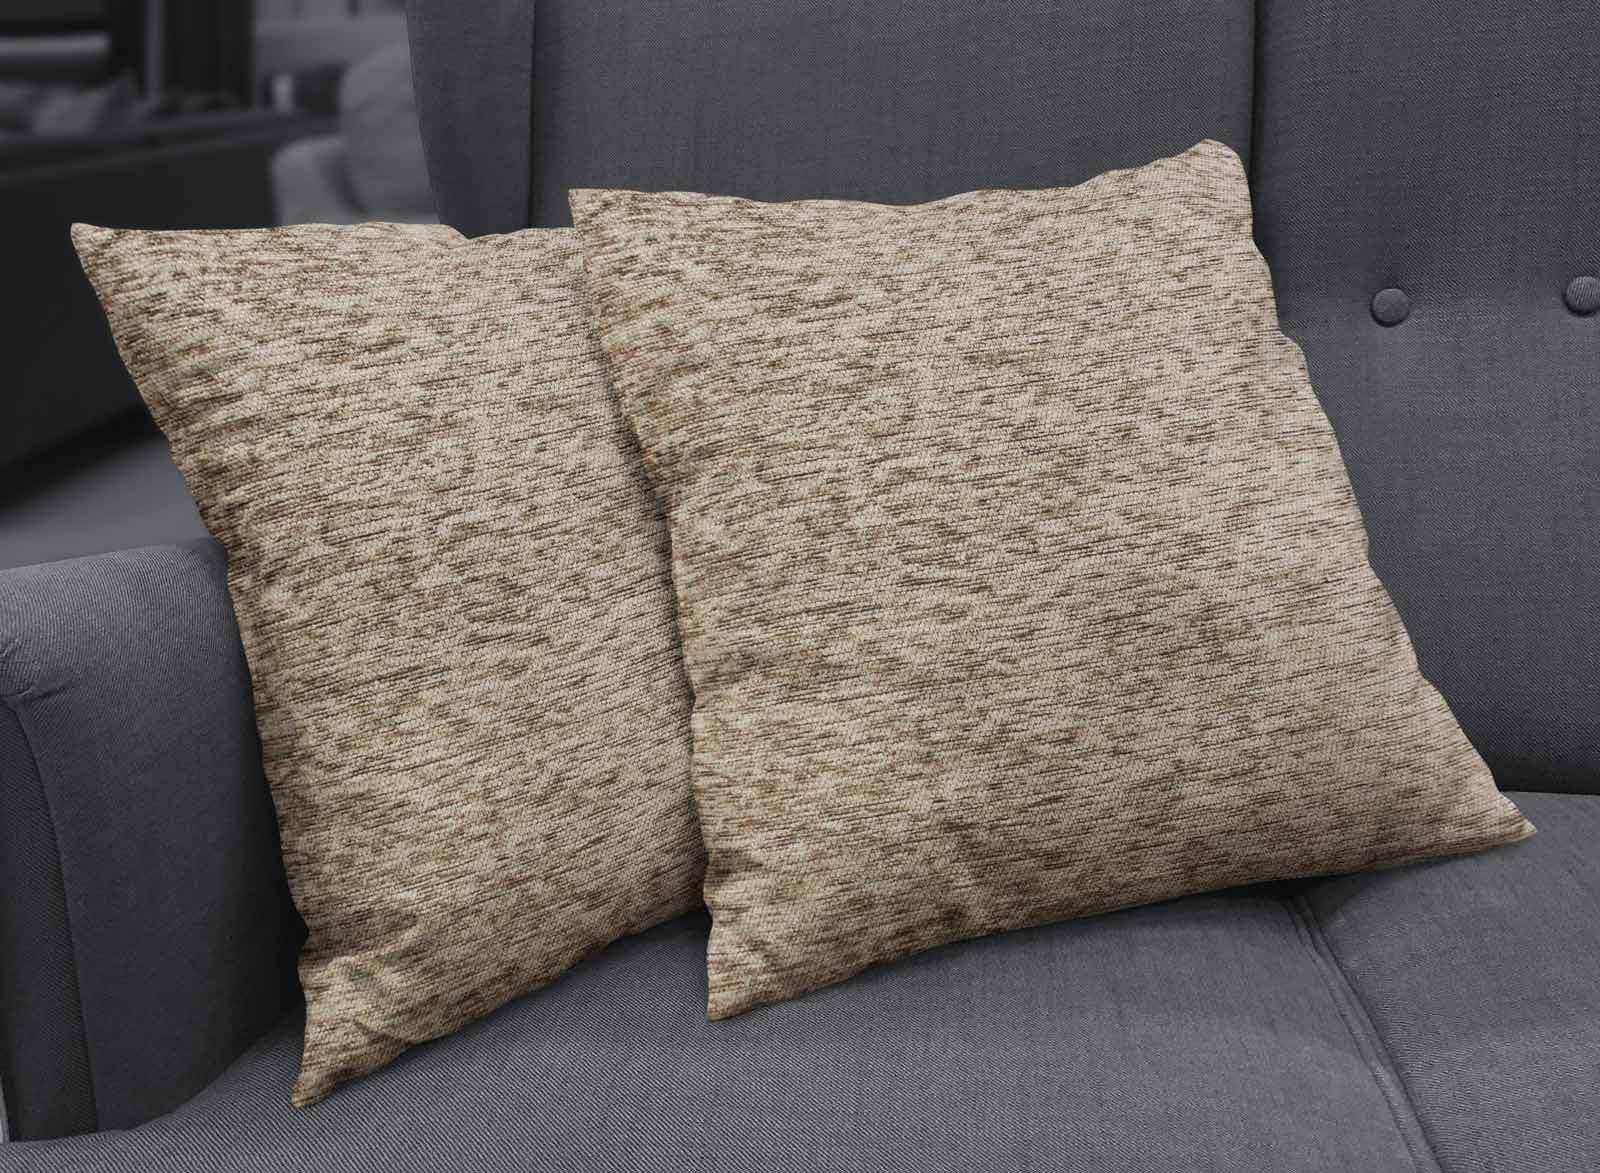 Set-of-2-Chenille-Cushion-Covers-Luxury-Plain-Cushions-Cover-Pairs-18-034-x-18-034 thumbnail 43